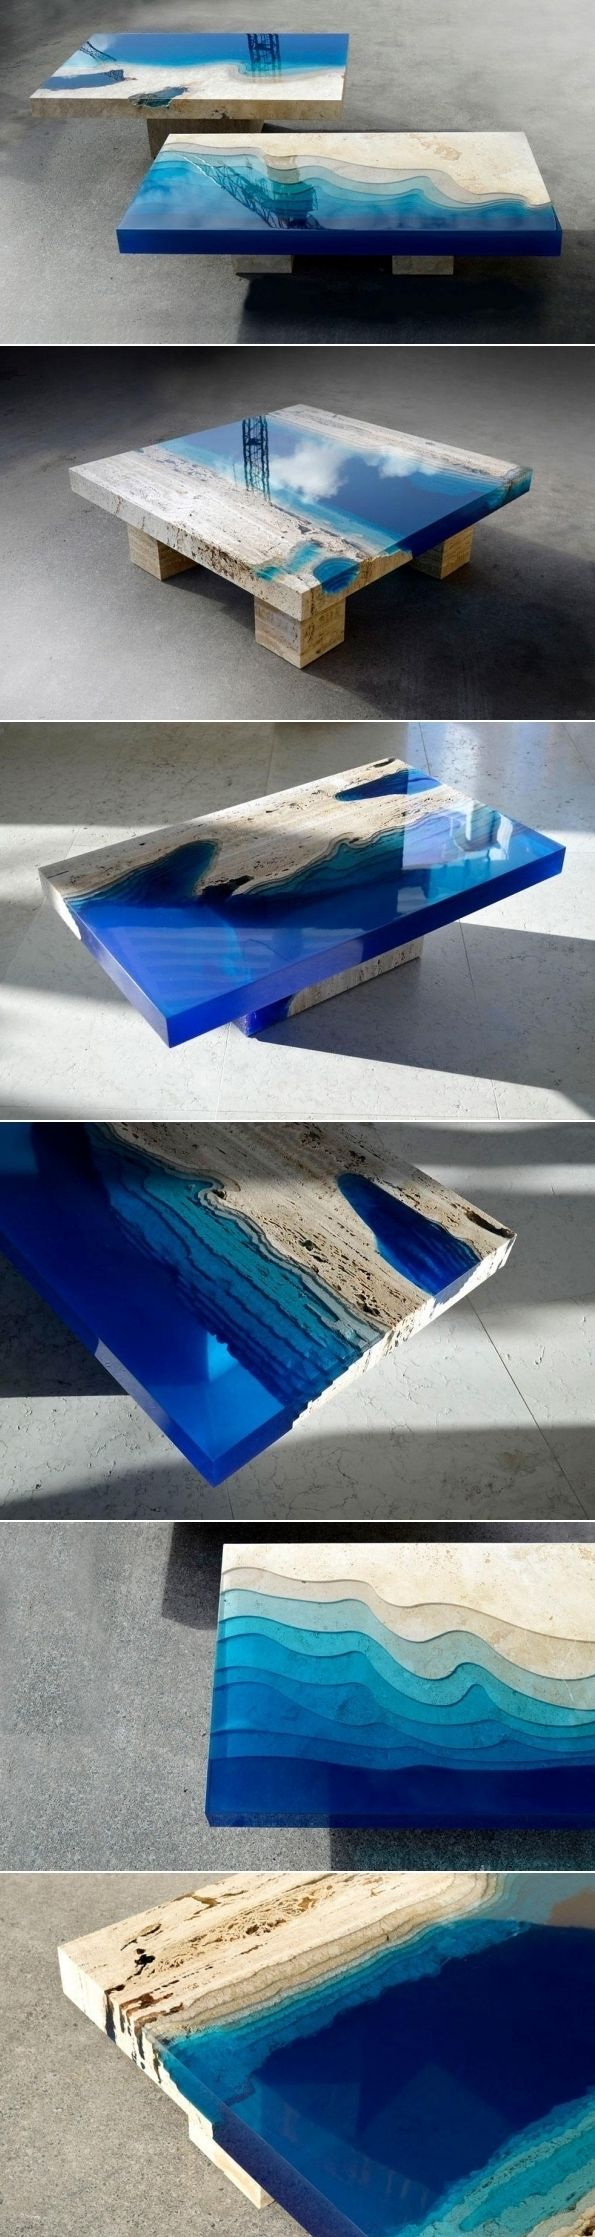 #furniture #materialsglass